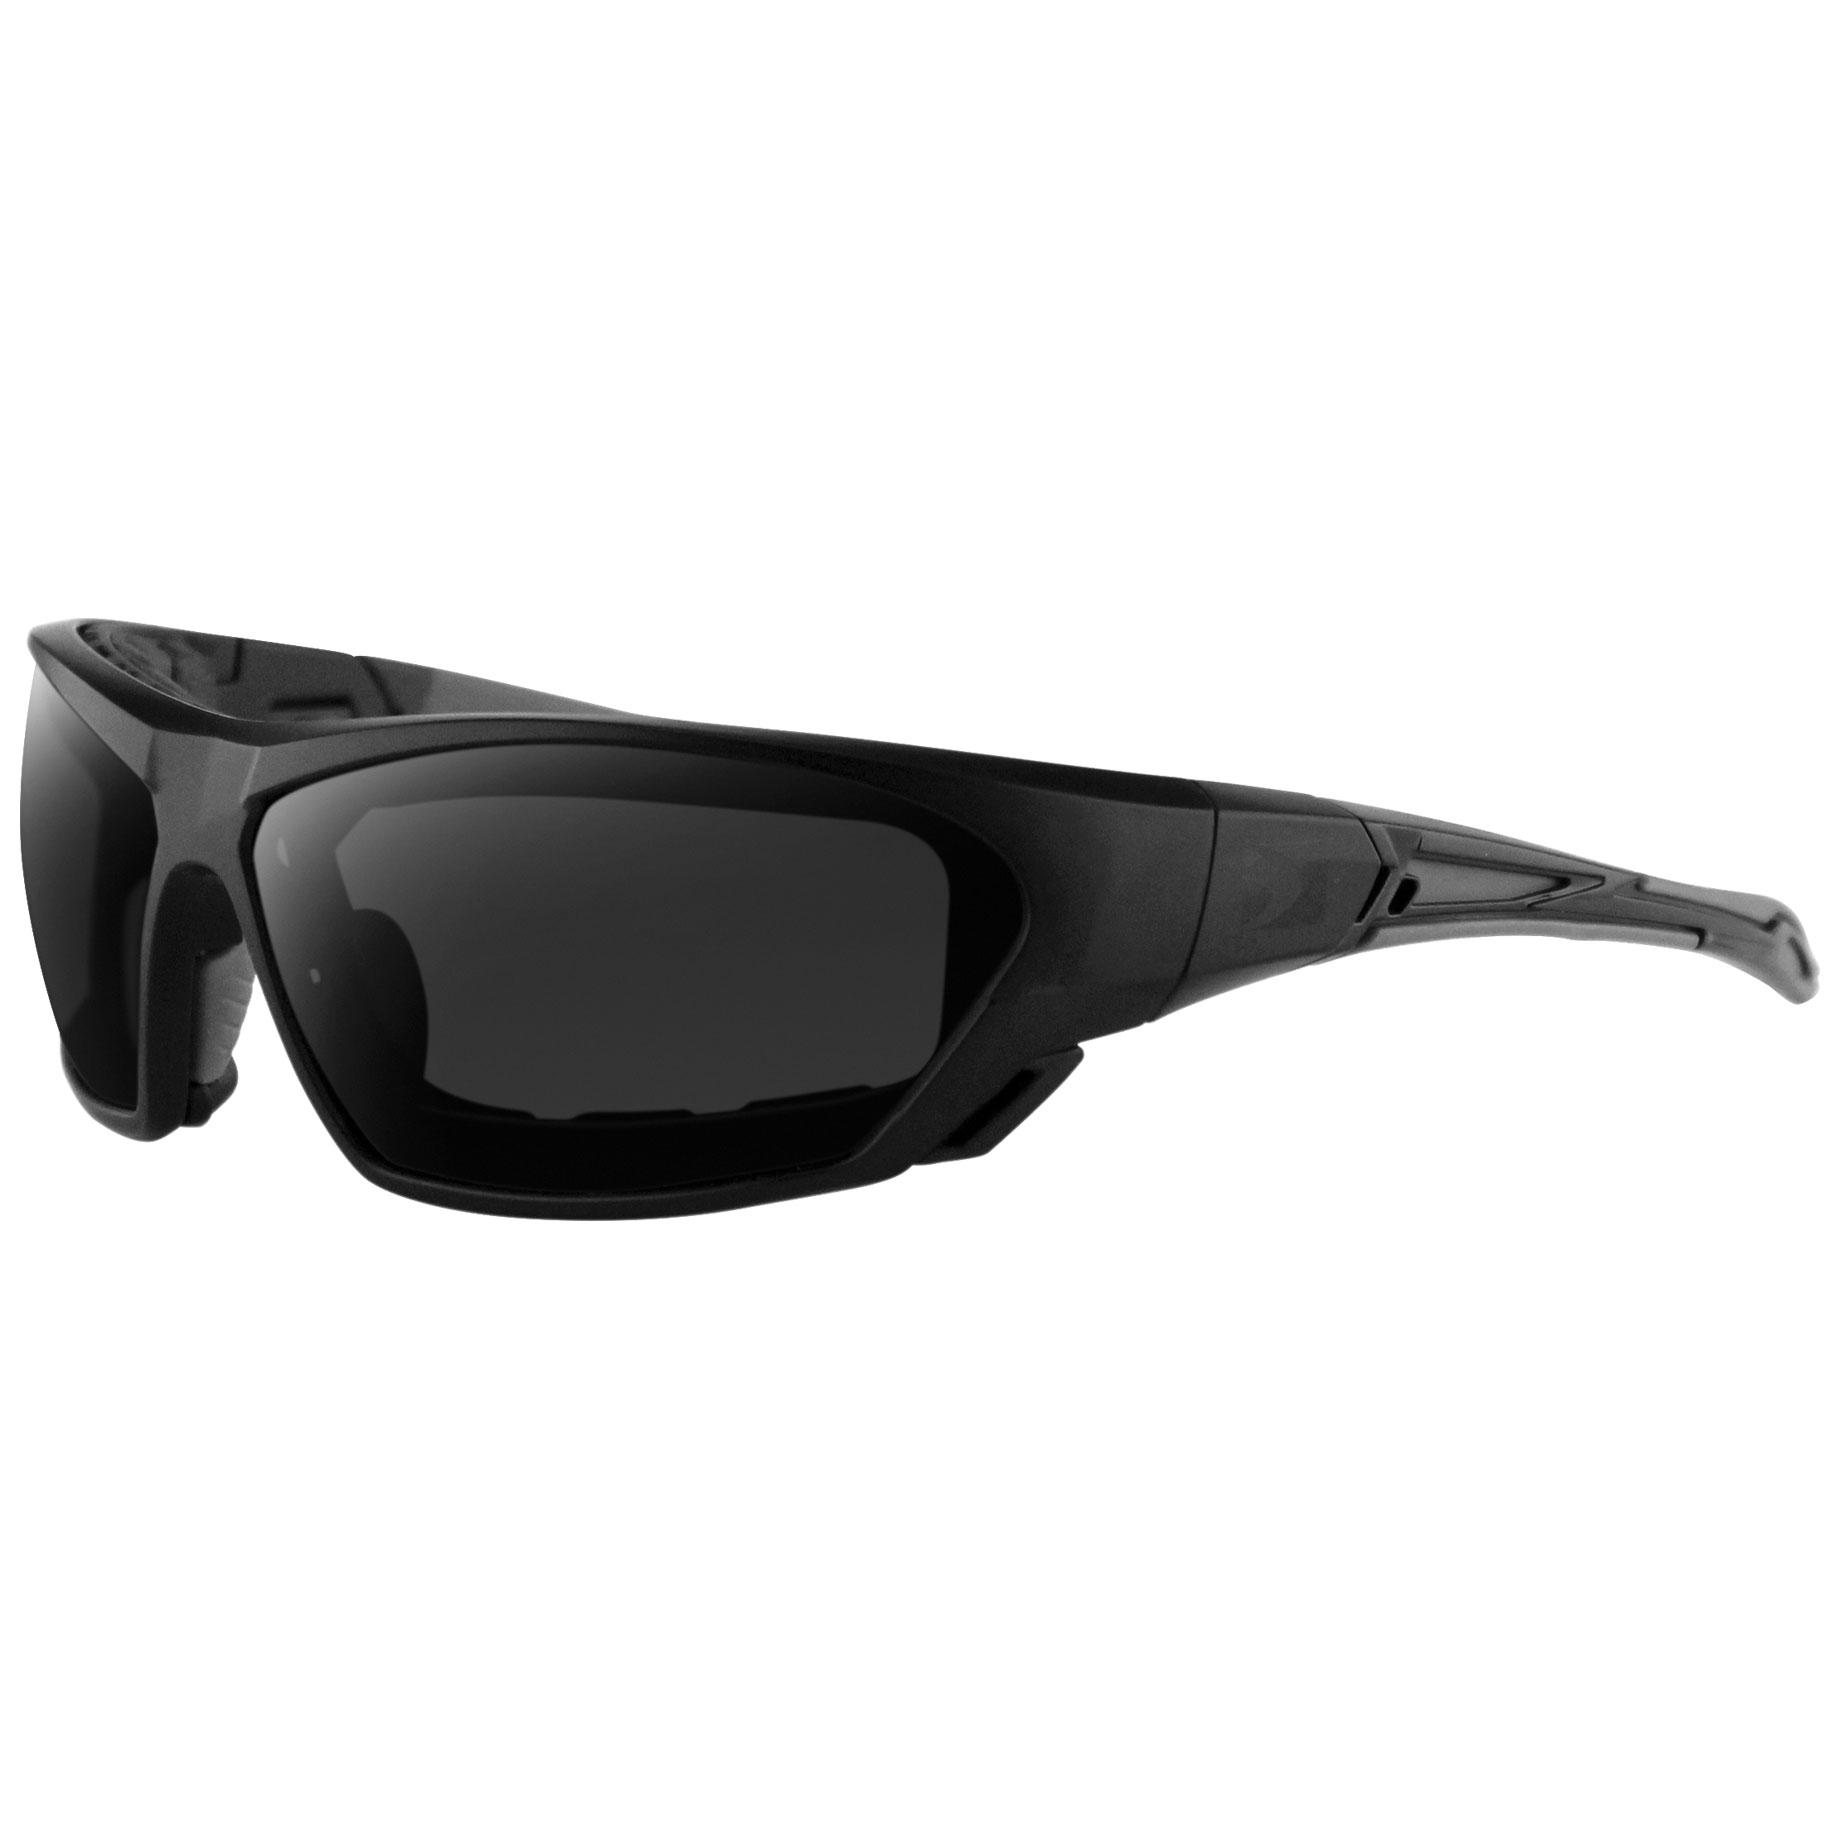 Bobster Crossover Convertible Matte Black Sunglasses